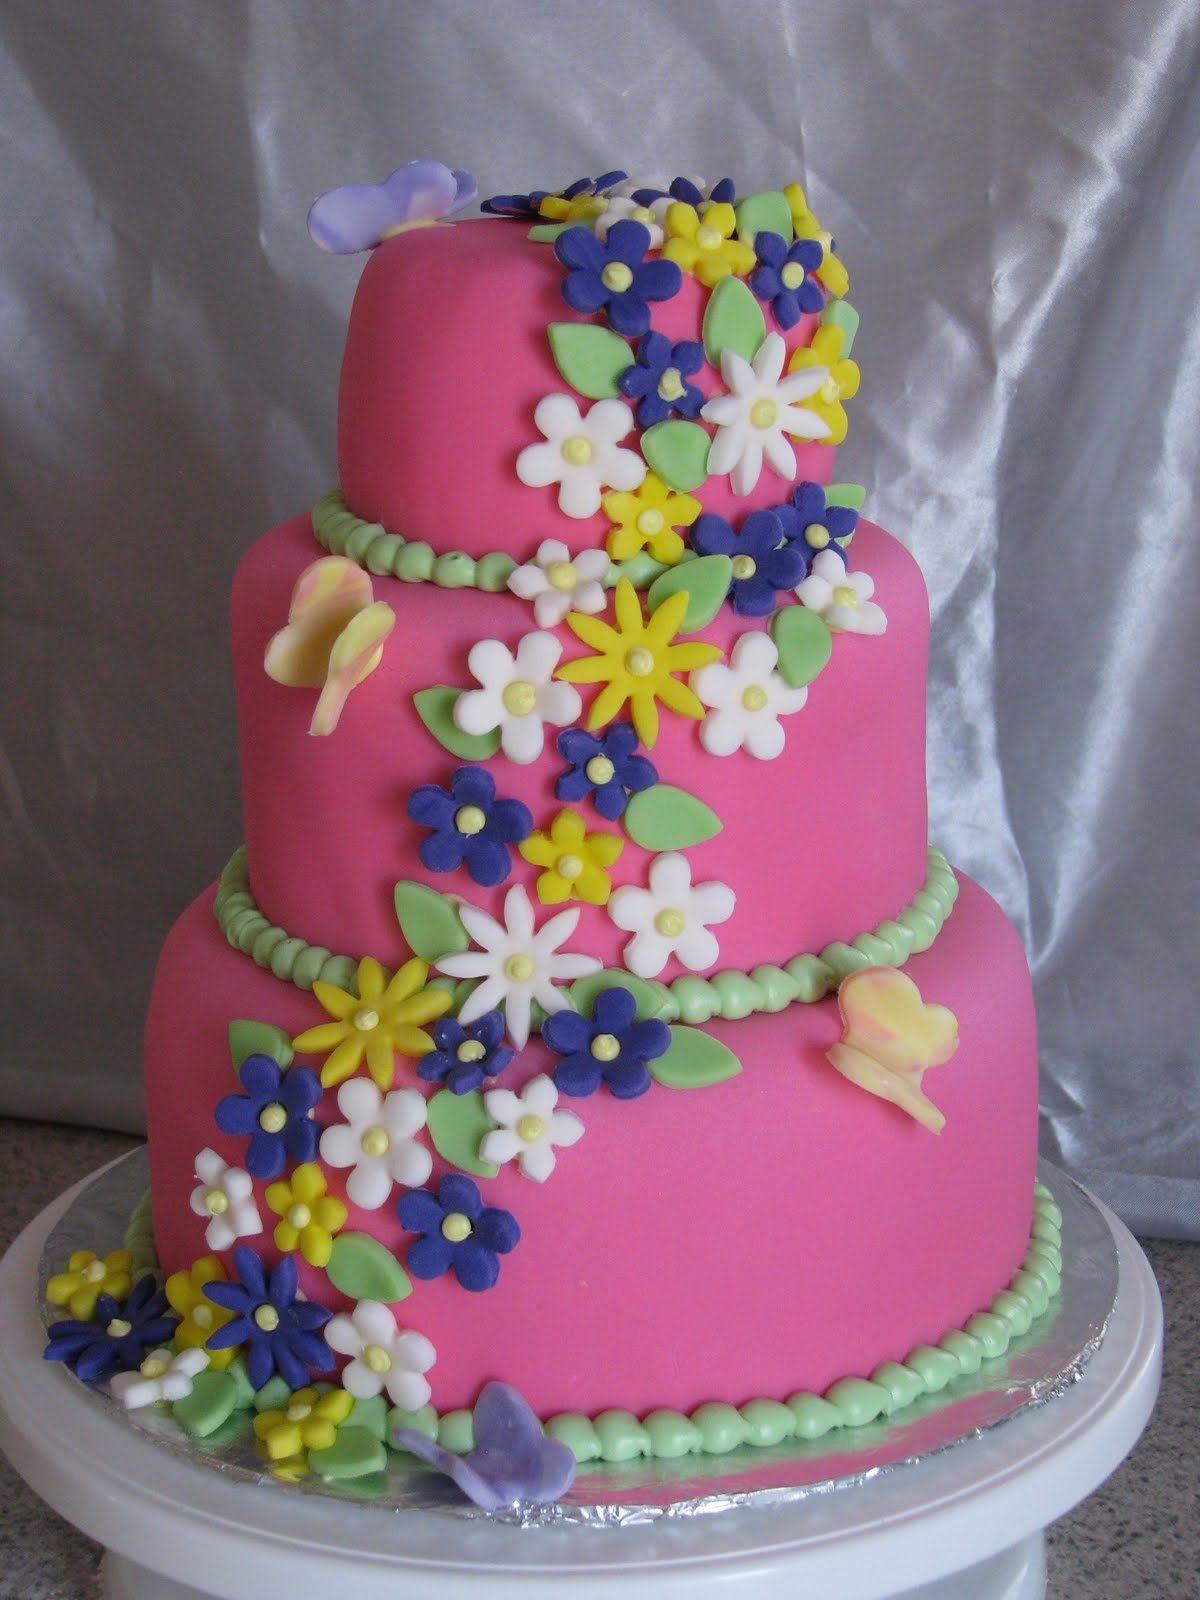 Girls Birthday Cakes 1st Birthday Cakes for Girls